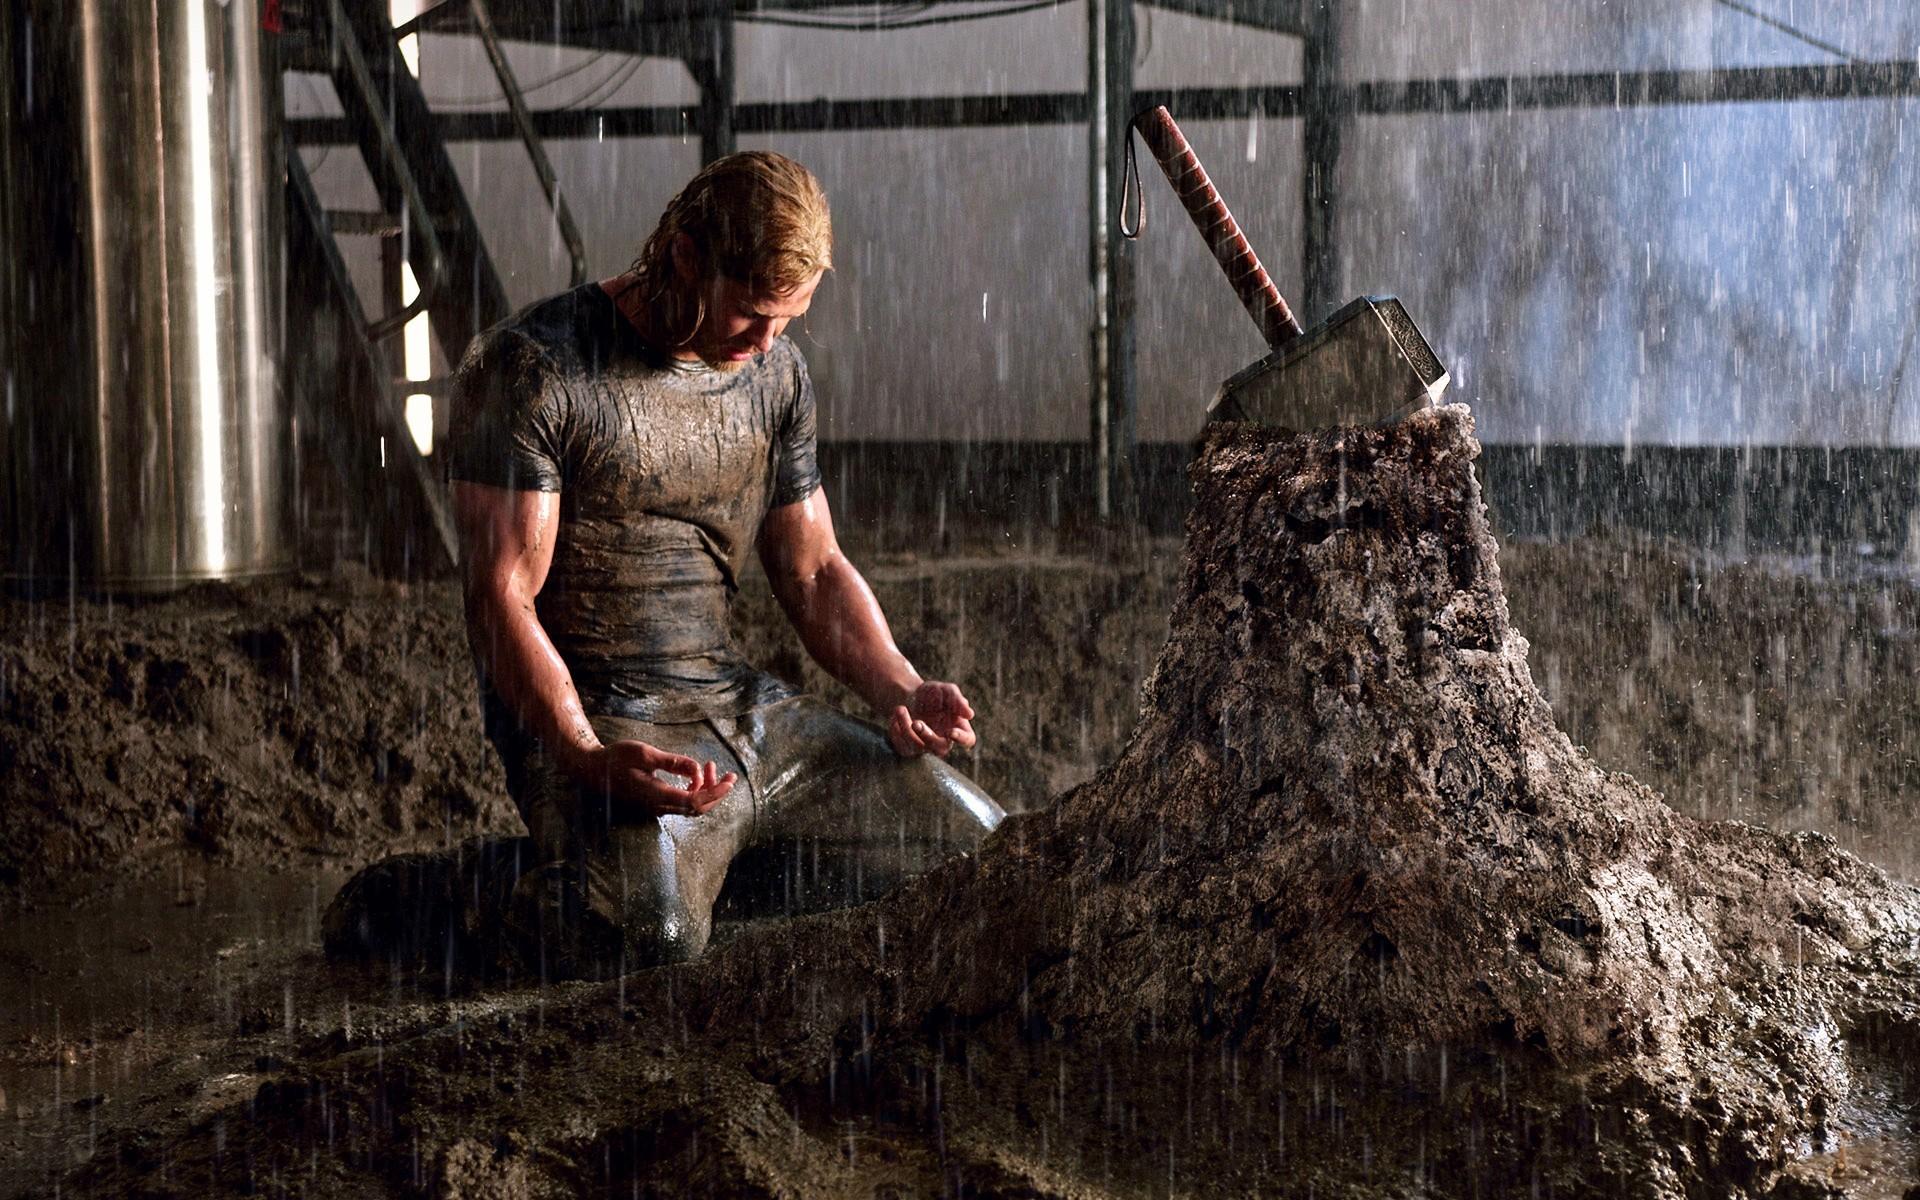 Rain thor men mud kneeling chris hemsworth thor (movie) mjolnir wallpaper      20046   WallpaperUP